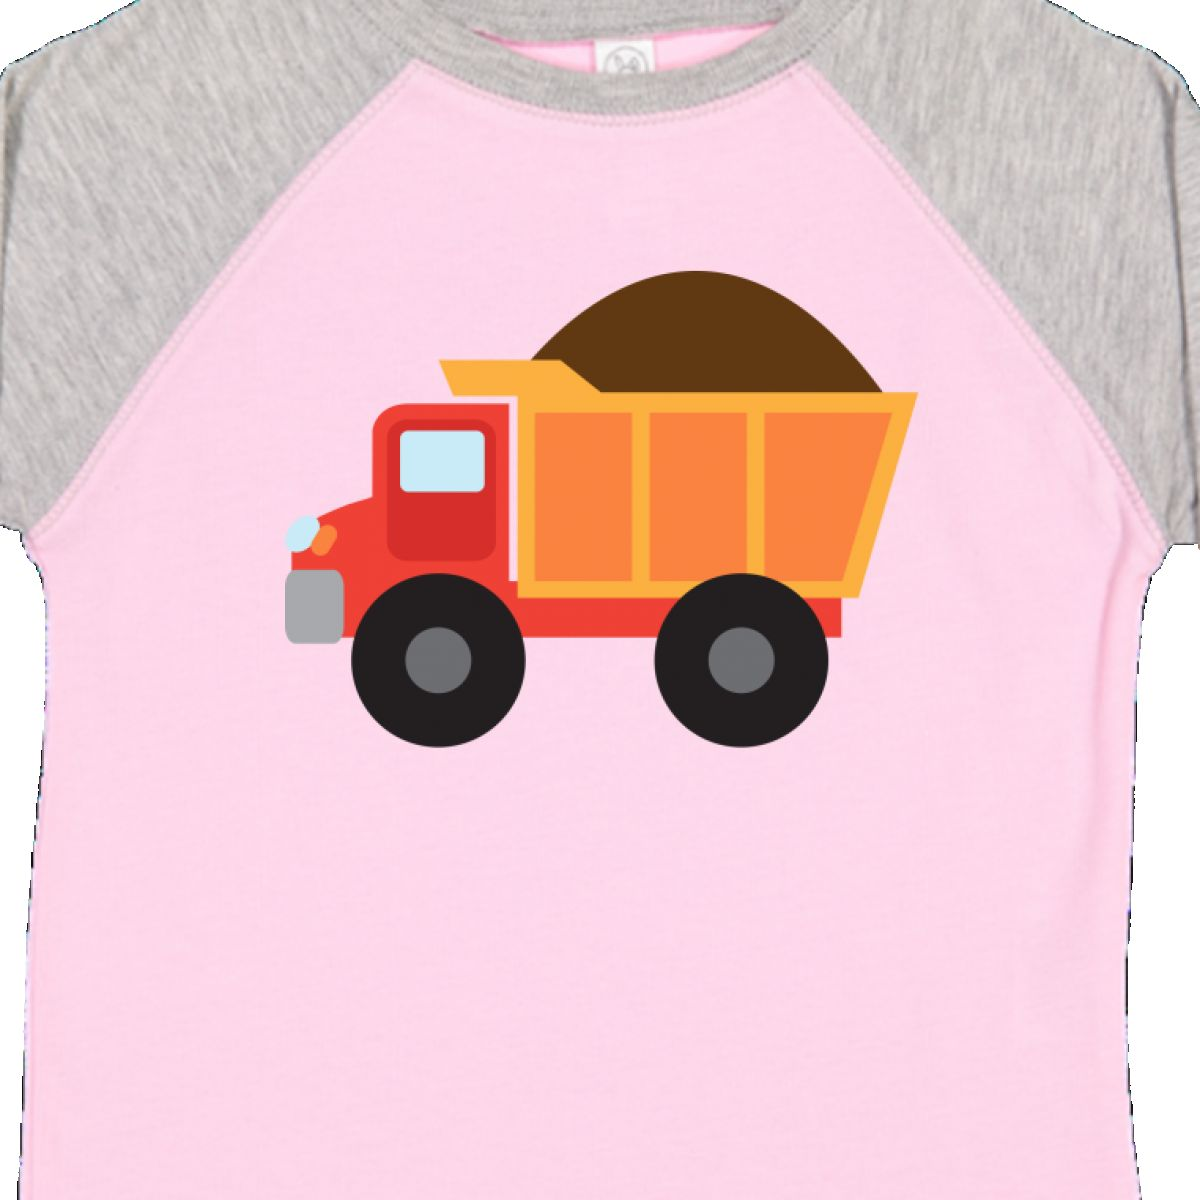 Inktastic-Work-Truck-Construction-Vehicle-Toddler-T-Shirt-Trucks-Vehicles-Cute thumbnail 28